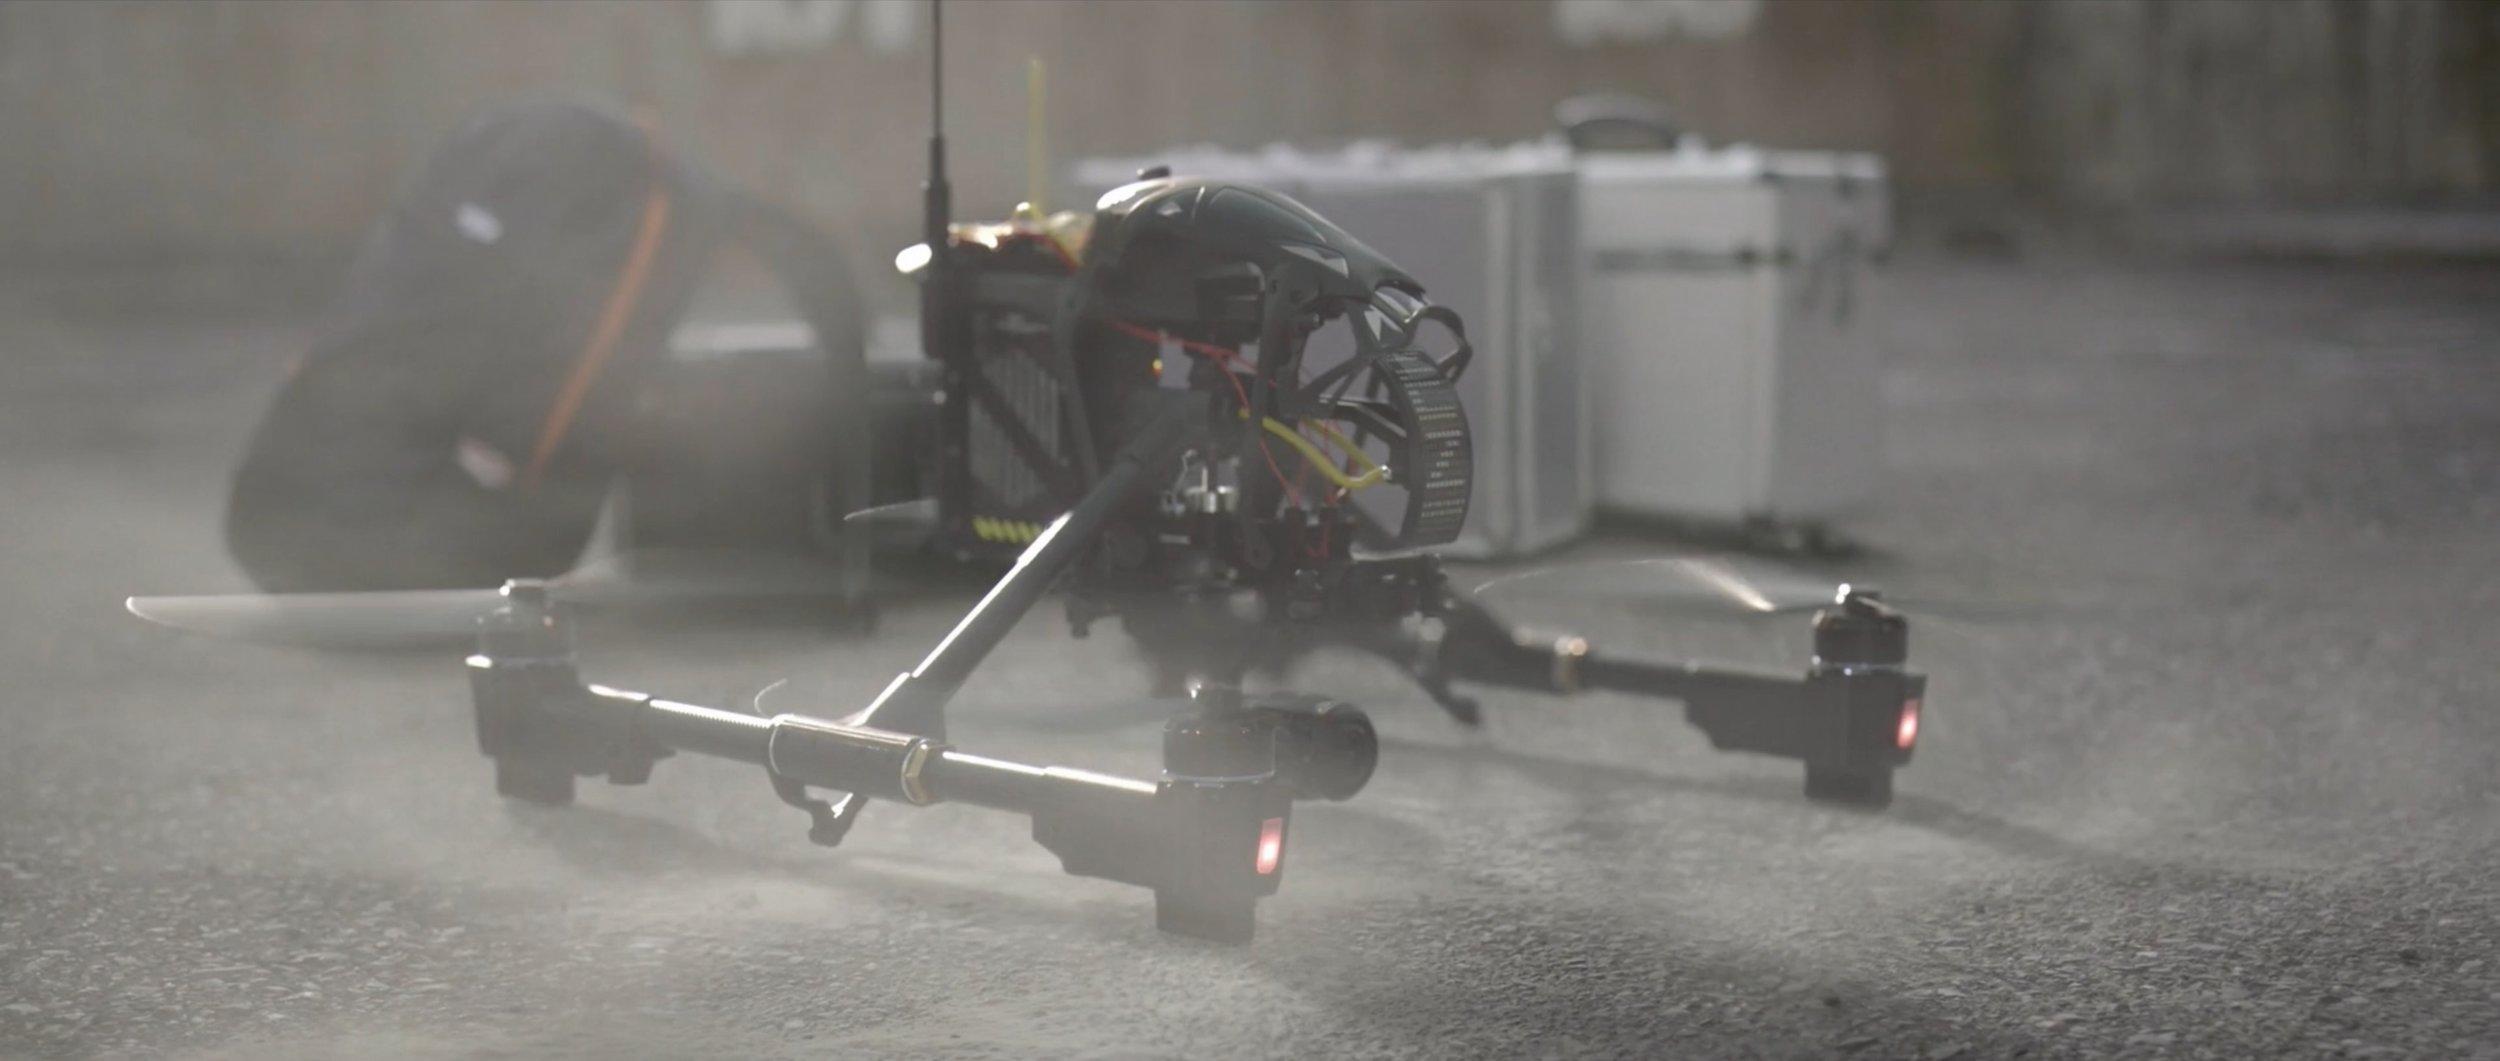 Nissan Drones - 01.jpeg